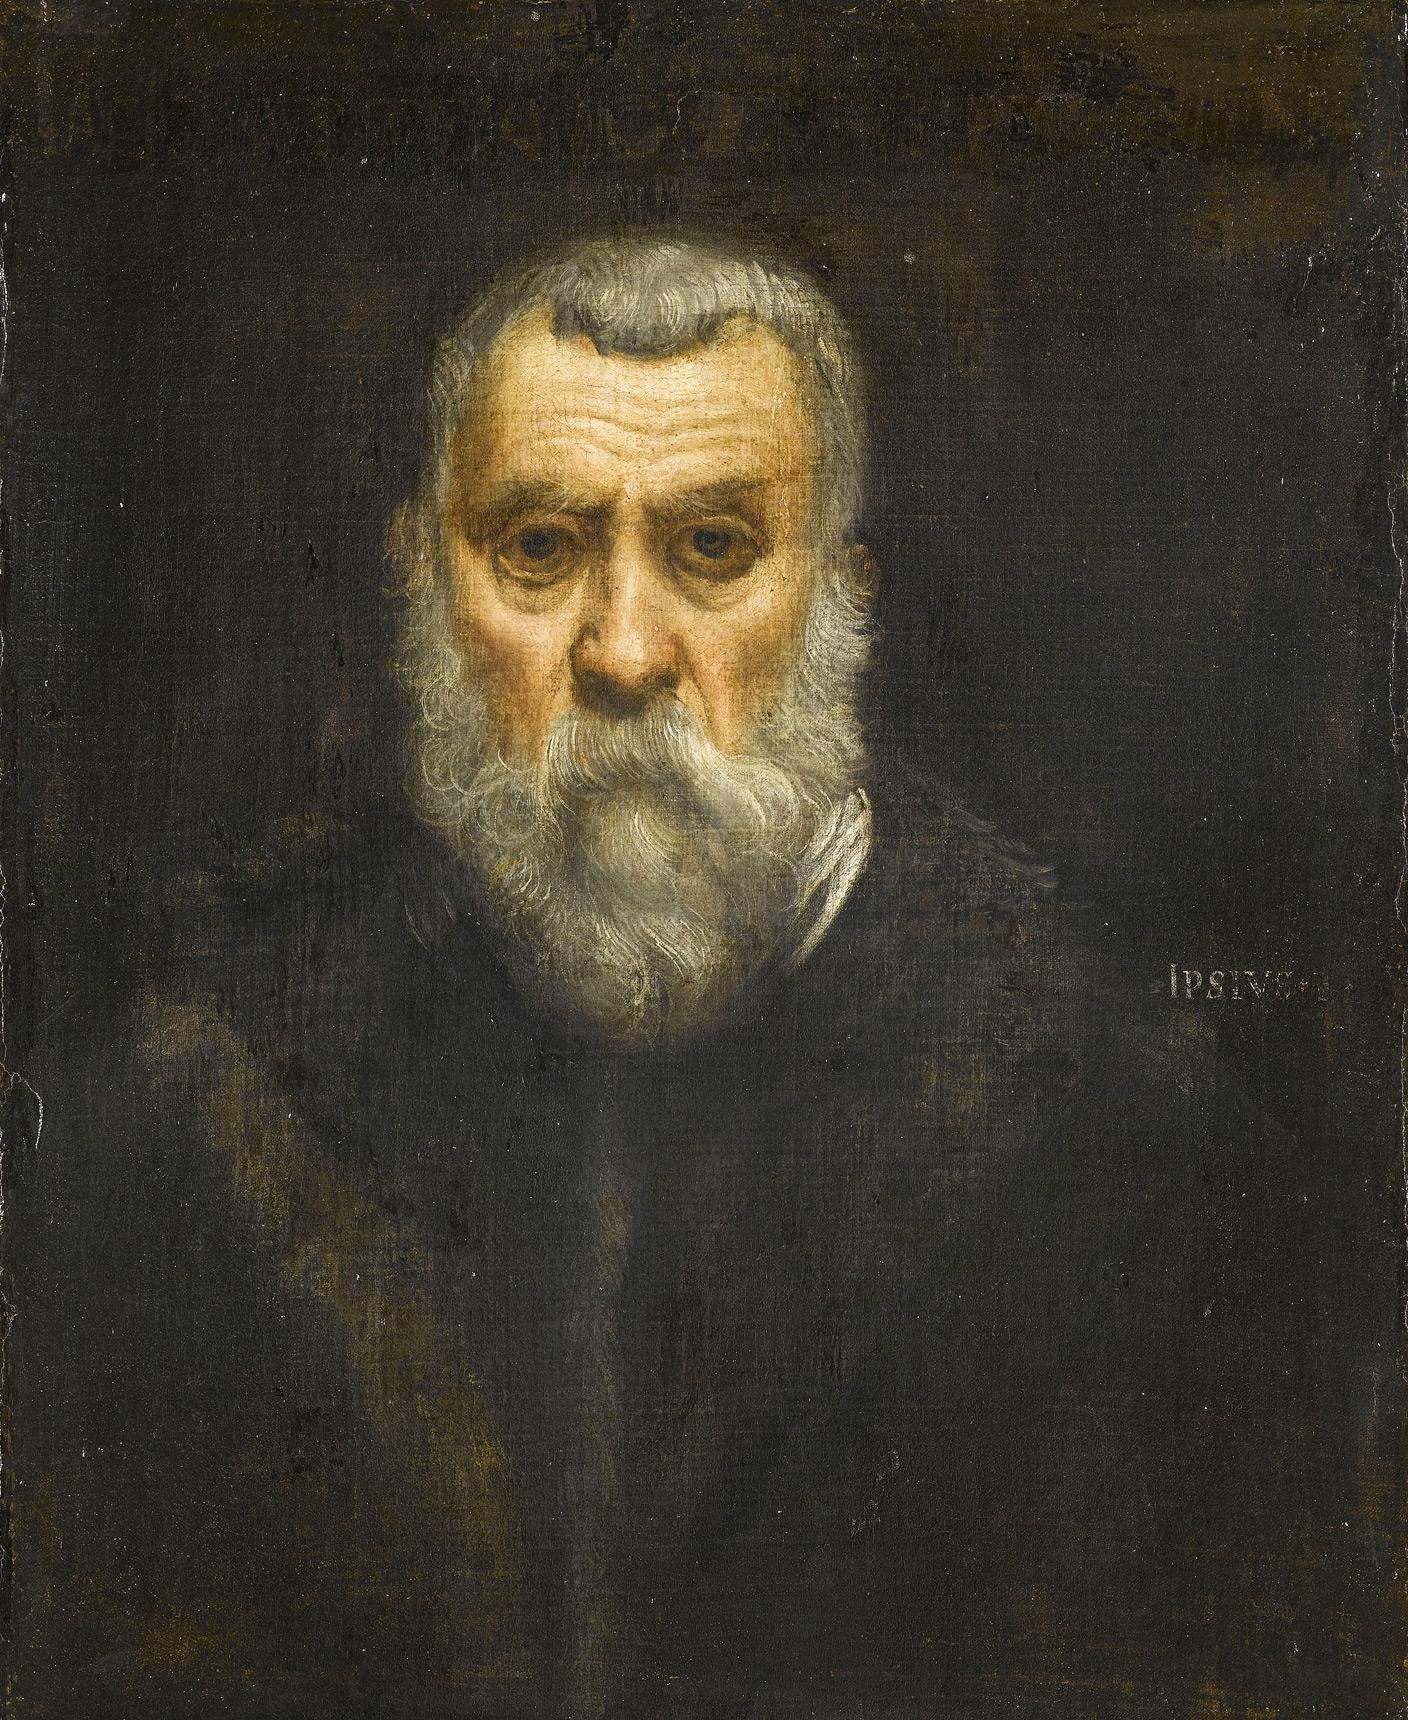 tintoretto_autoportrait-1588.jpg